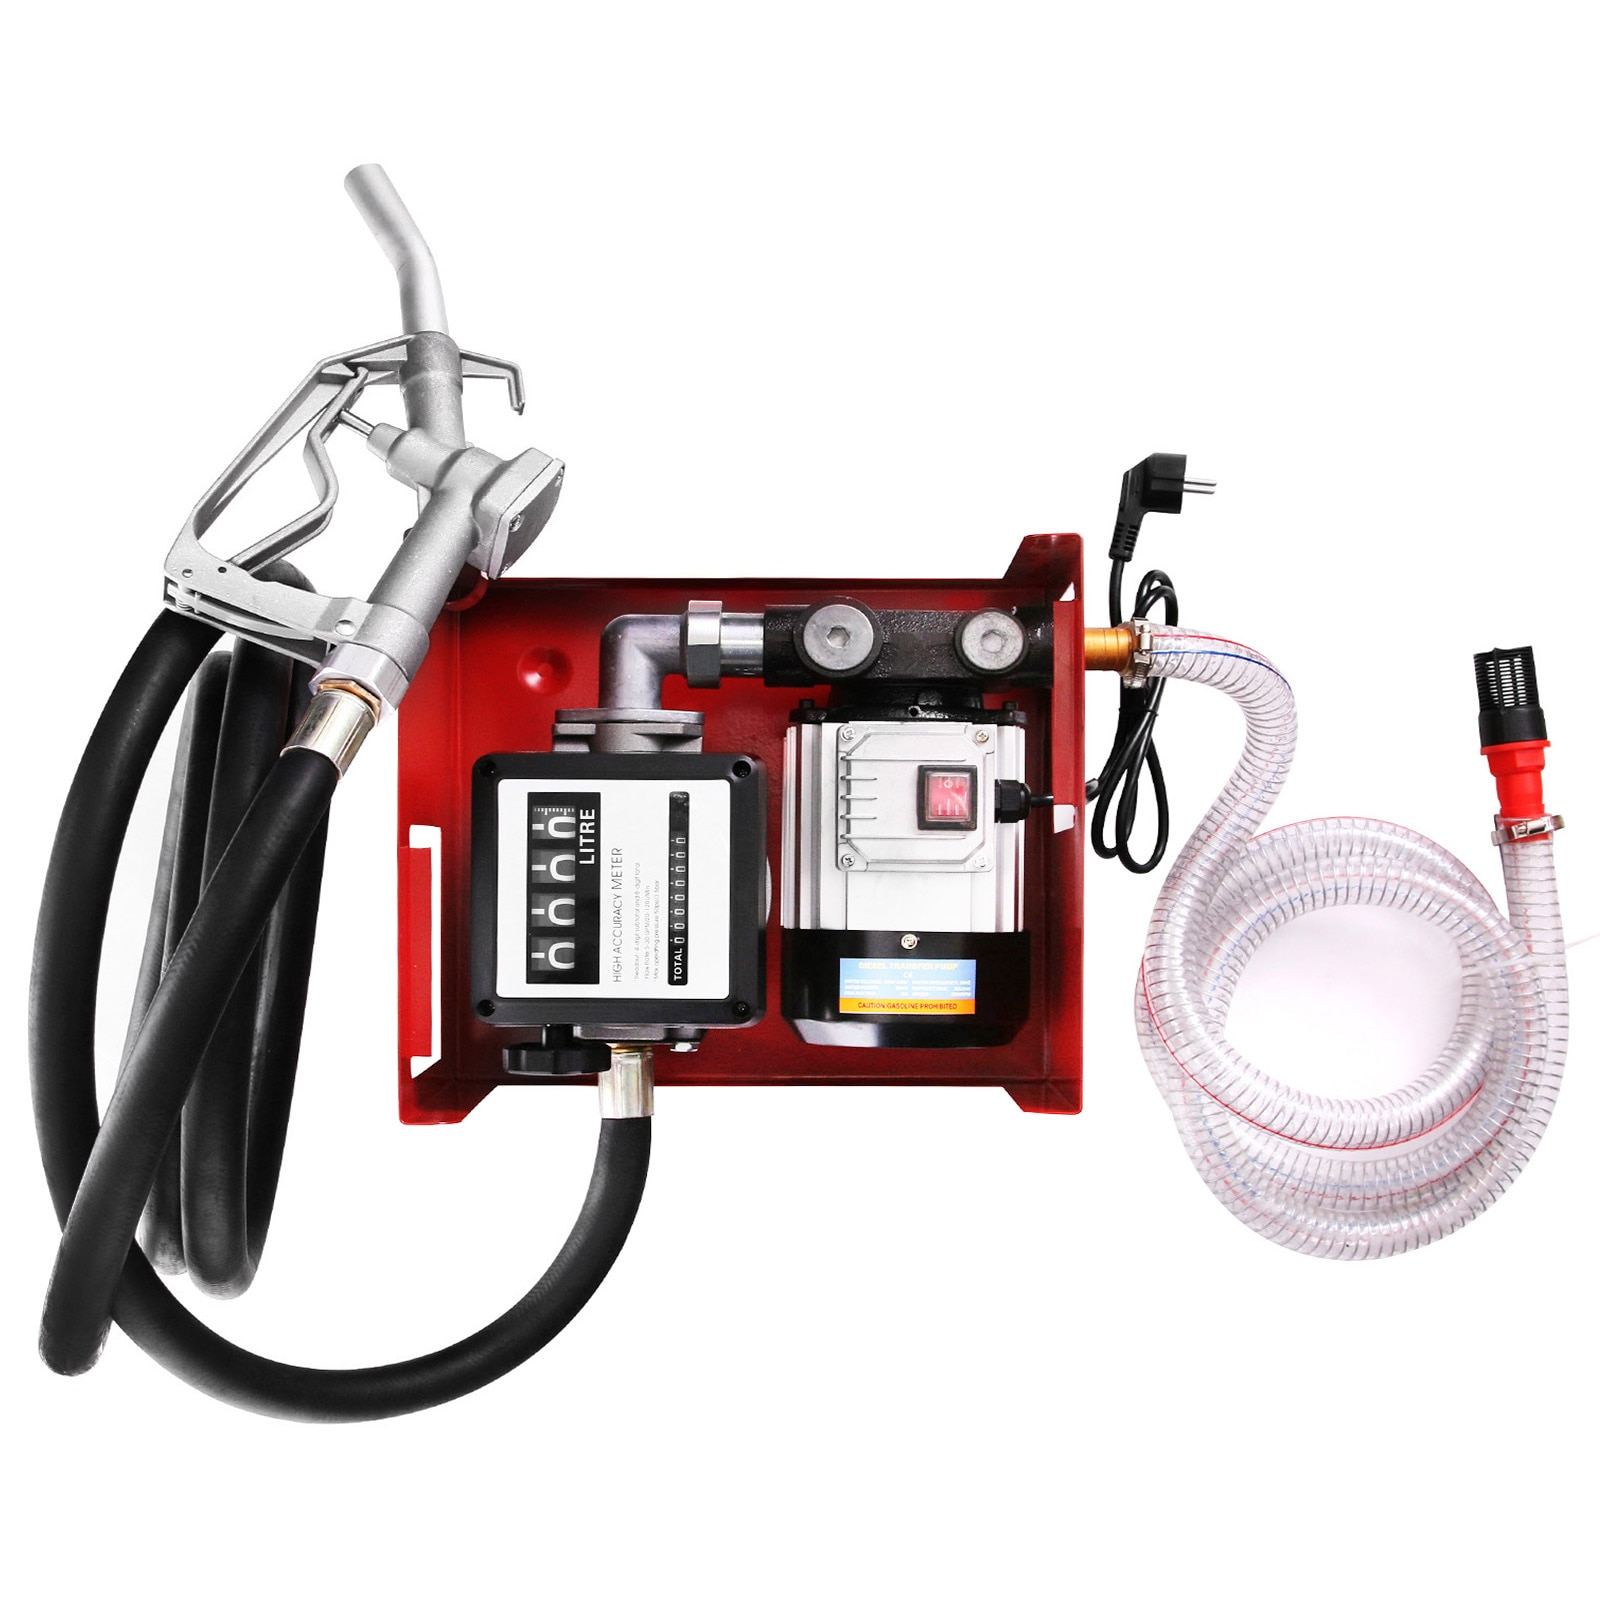 Disel Pump Heating Oil Pump 550 W 220 V Single Phase Motor for Blo-Fuel 60 L/min Electric Fuel Oil Pump enlarge